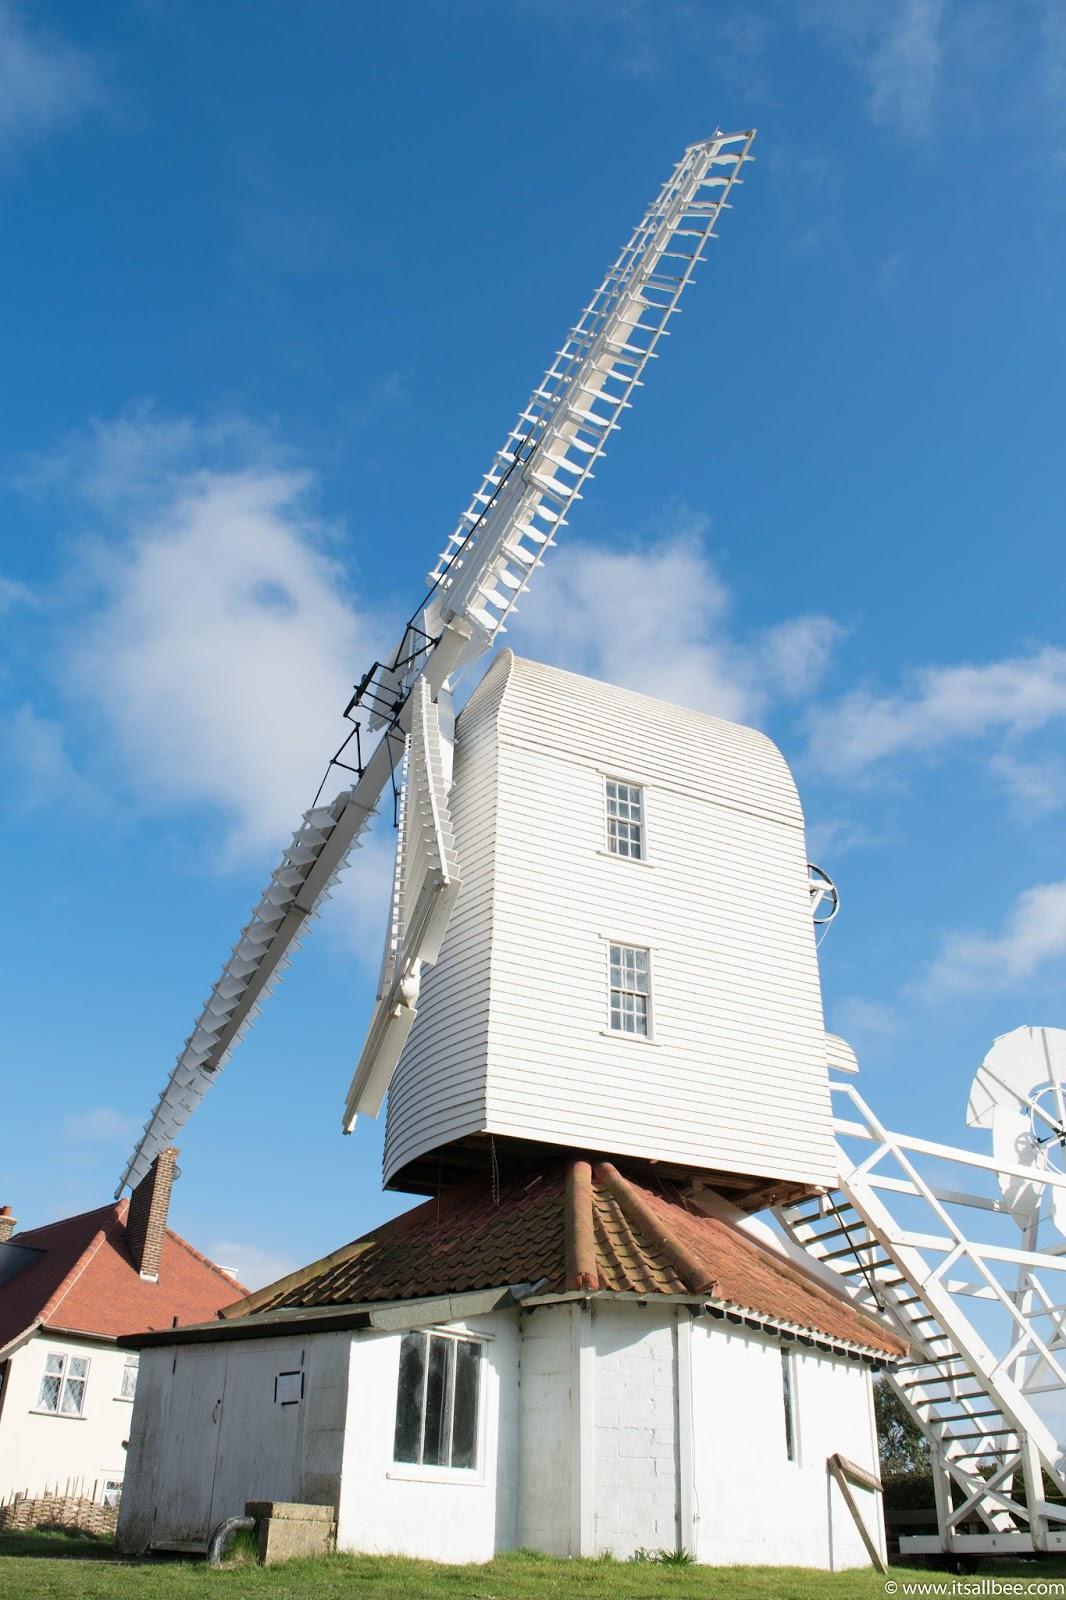 Exploring Thorpeness In Suffolk - An England's Hidden Gem #traveltips #countryside #norfolk #britain #hiddengems